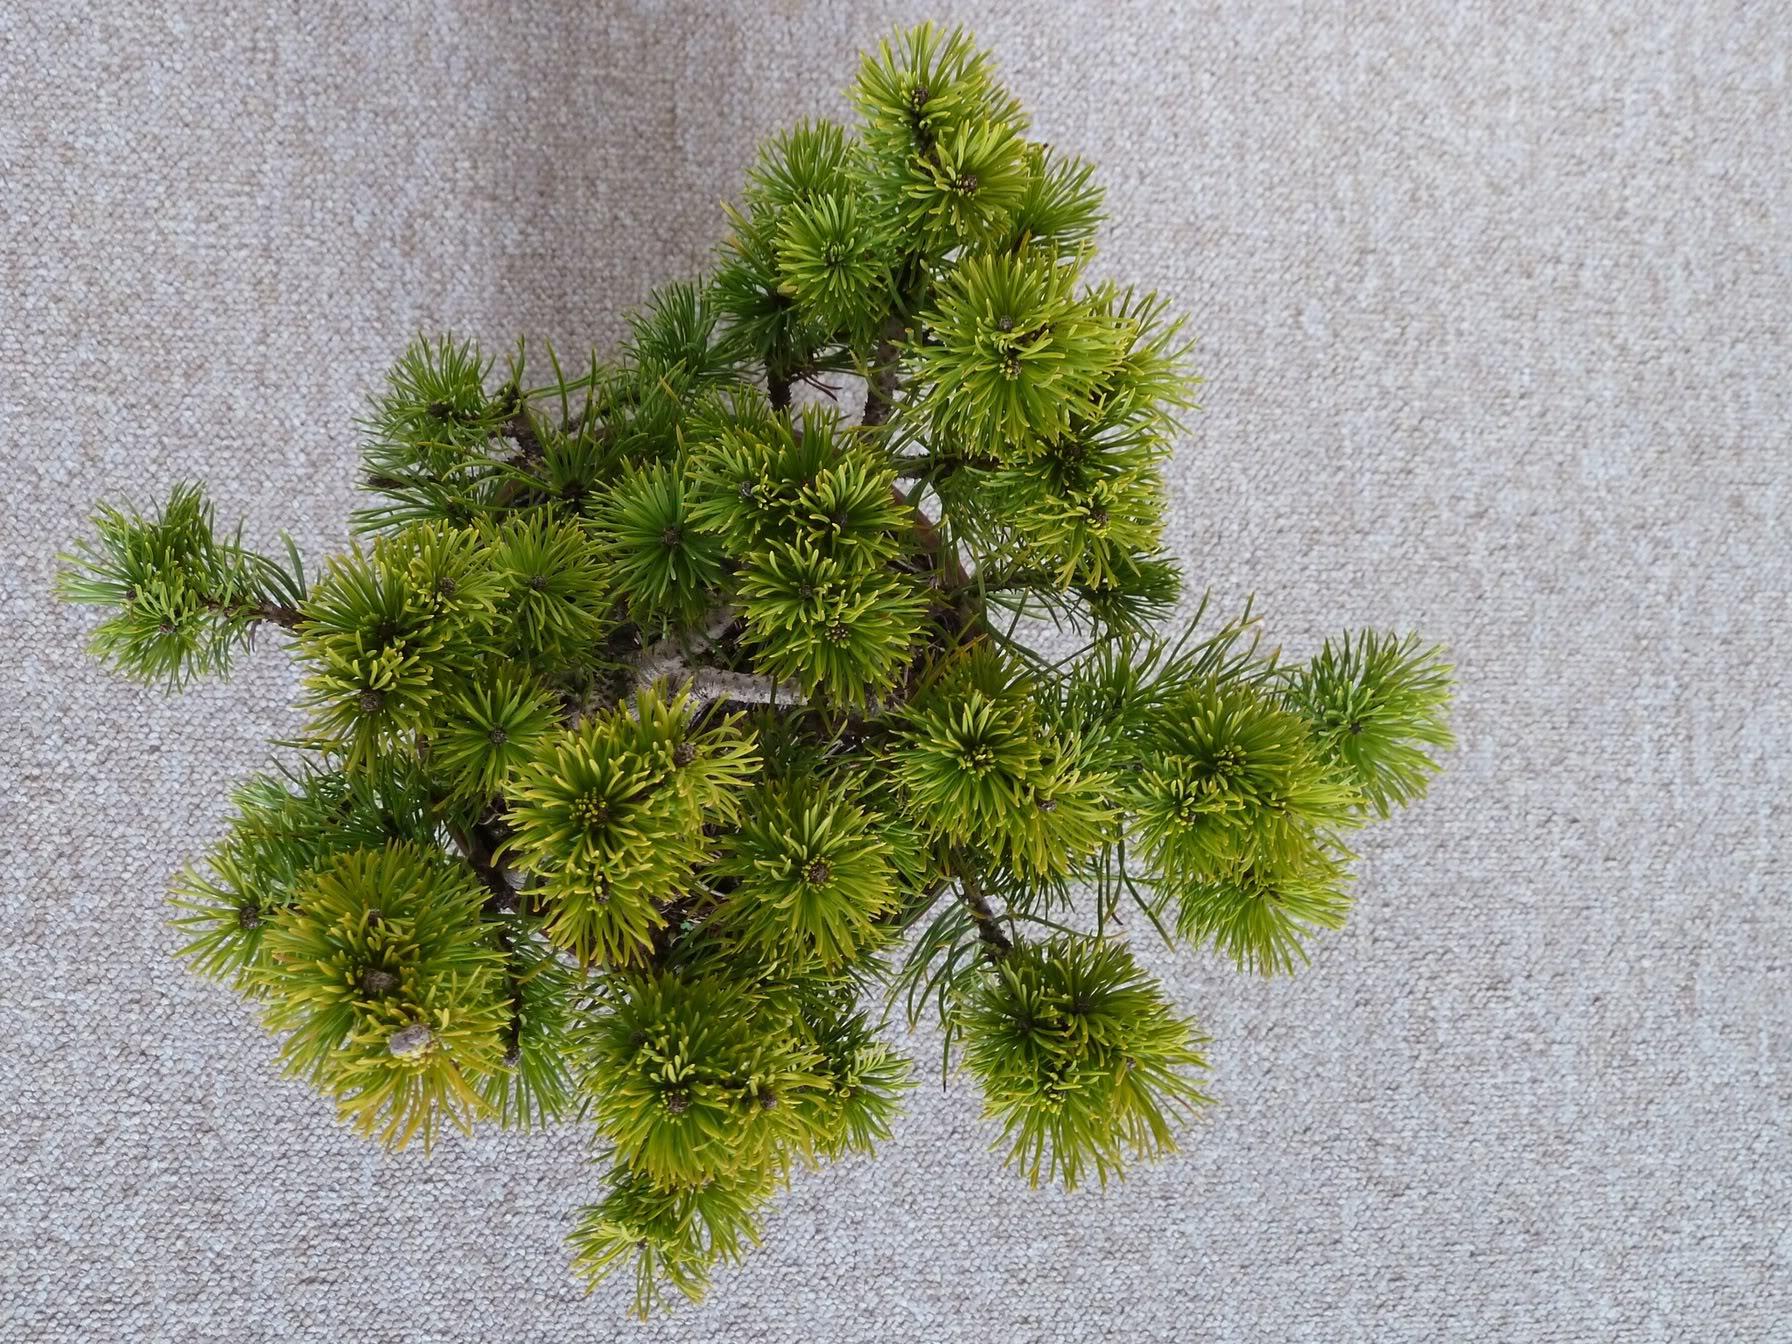 Ayuda con poda de formación de pinus mugo P1010328